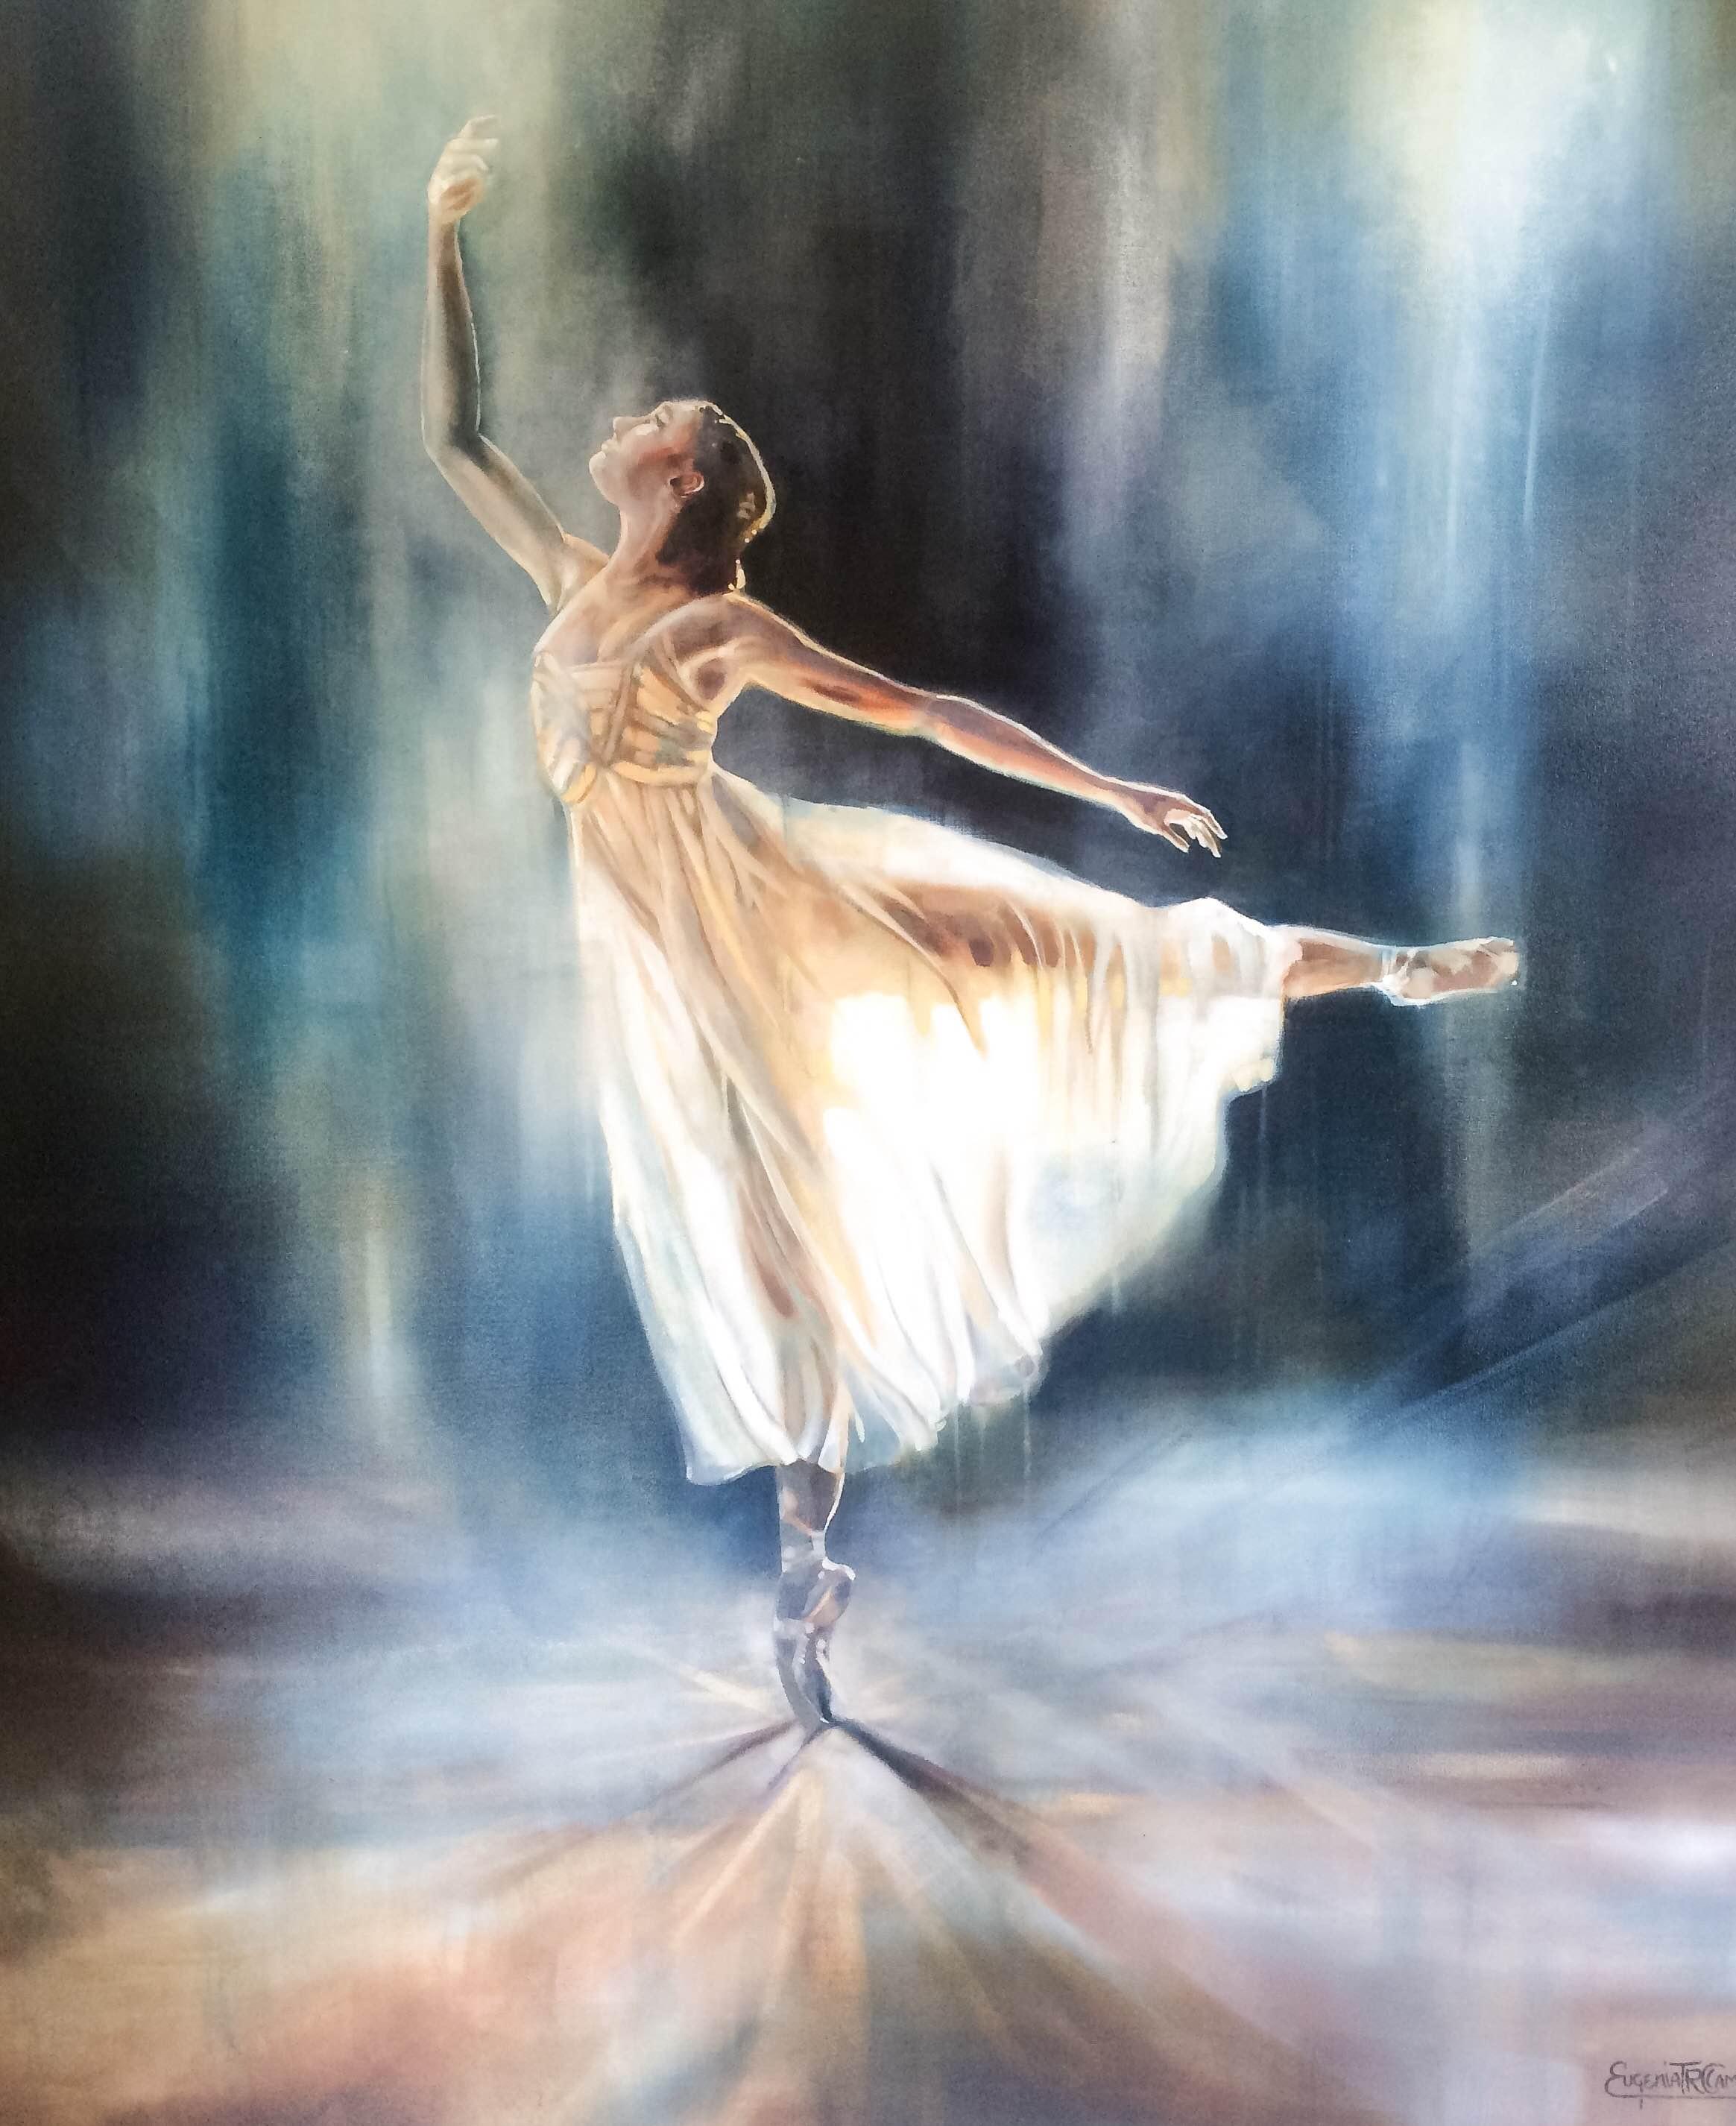 Eugenia - Ballet Dancer (1)